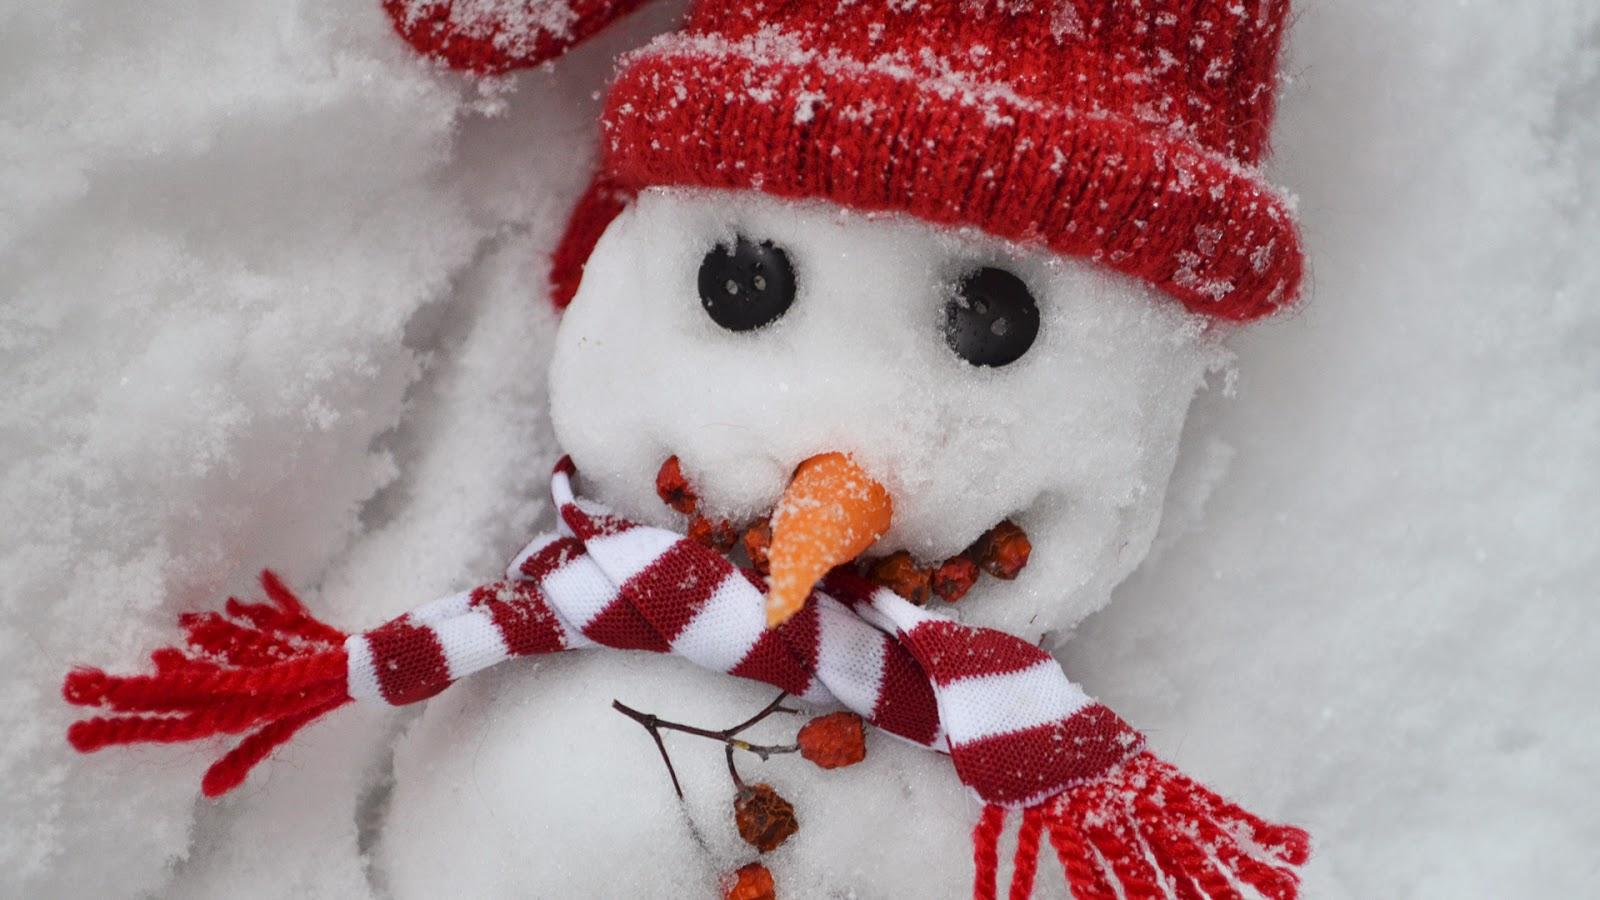 Beautiful-attractive-snowman-handmade-home-outdoor-craft-photos-HD-images.jpg